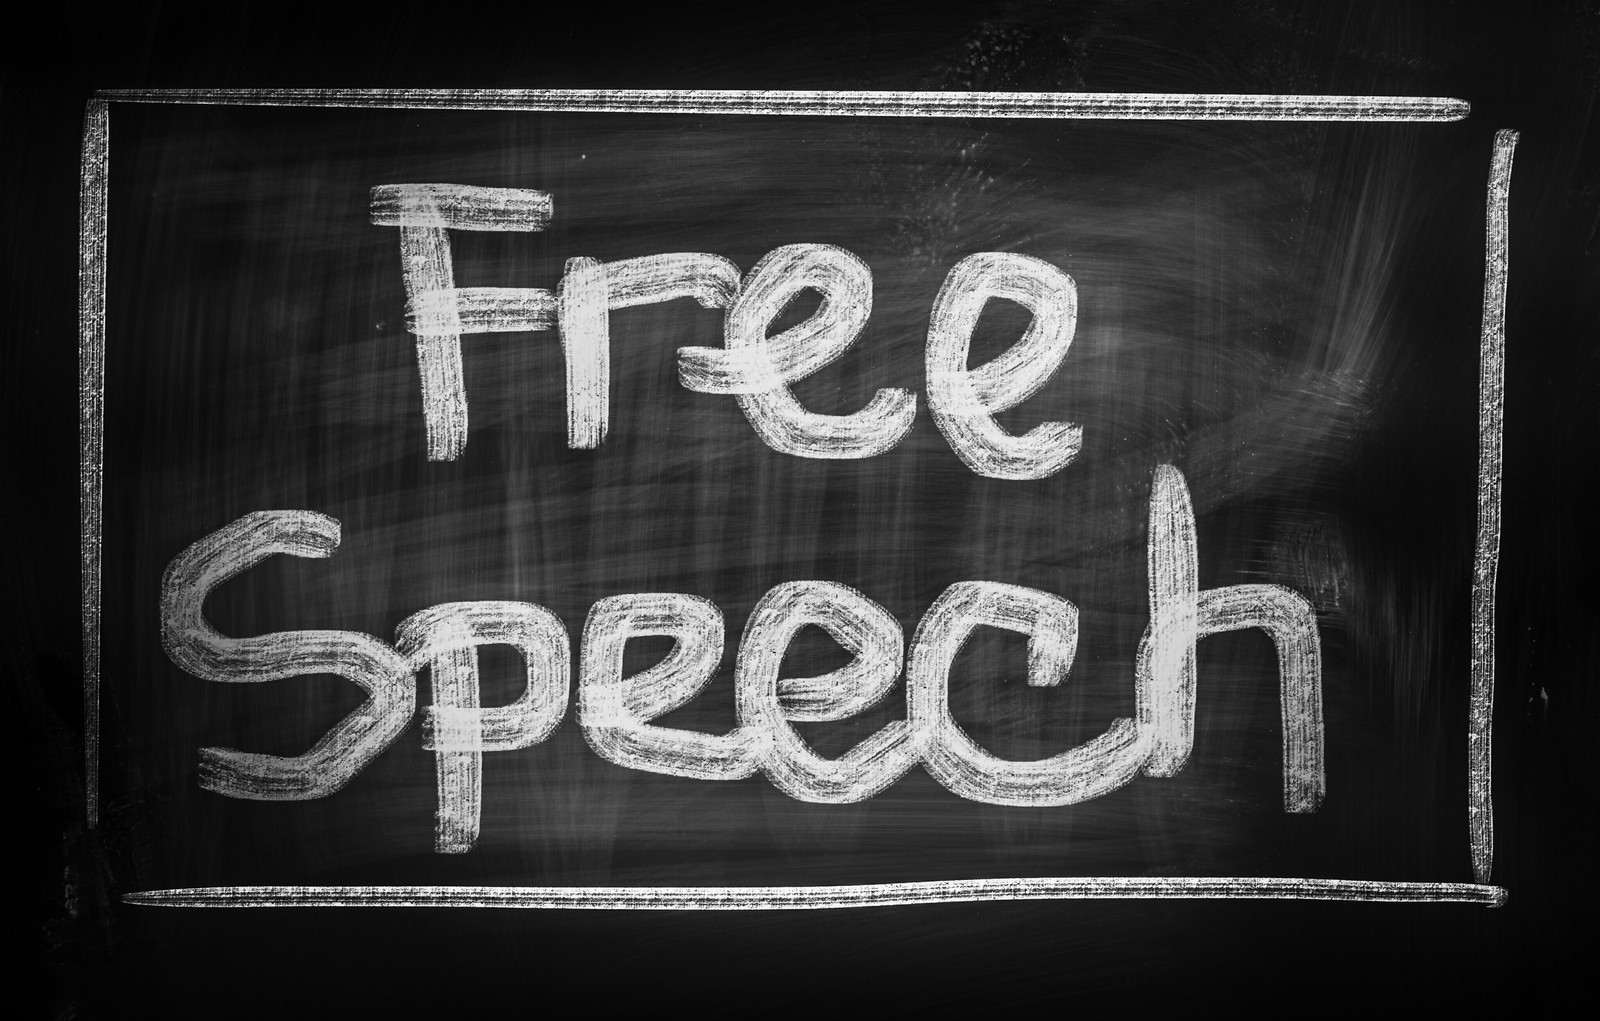 free speech Opinion: champions of free speech should start saying something worth hearing.